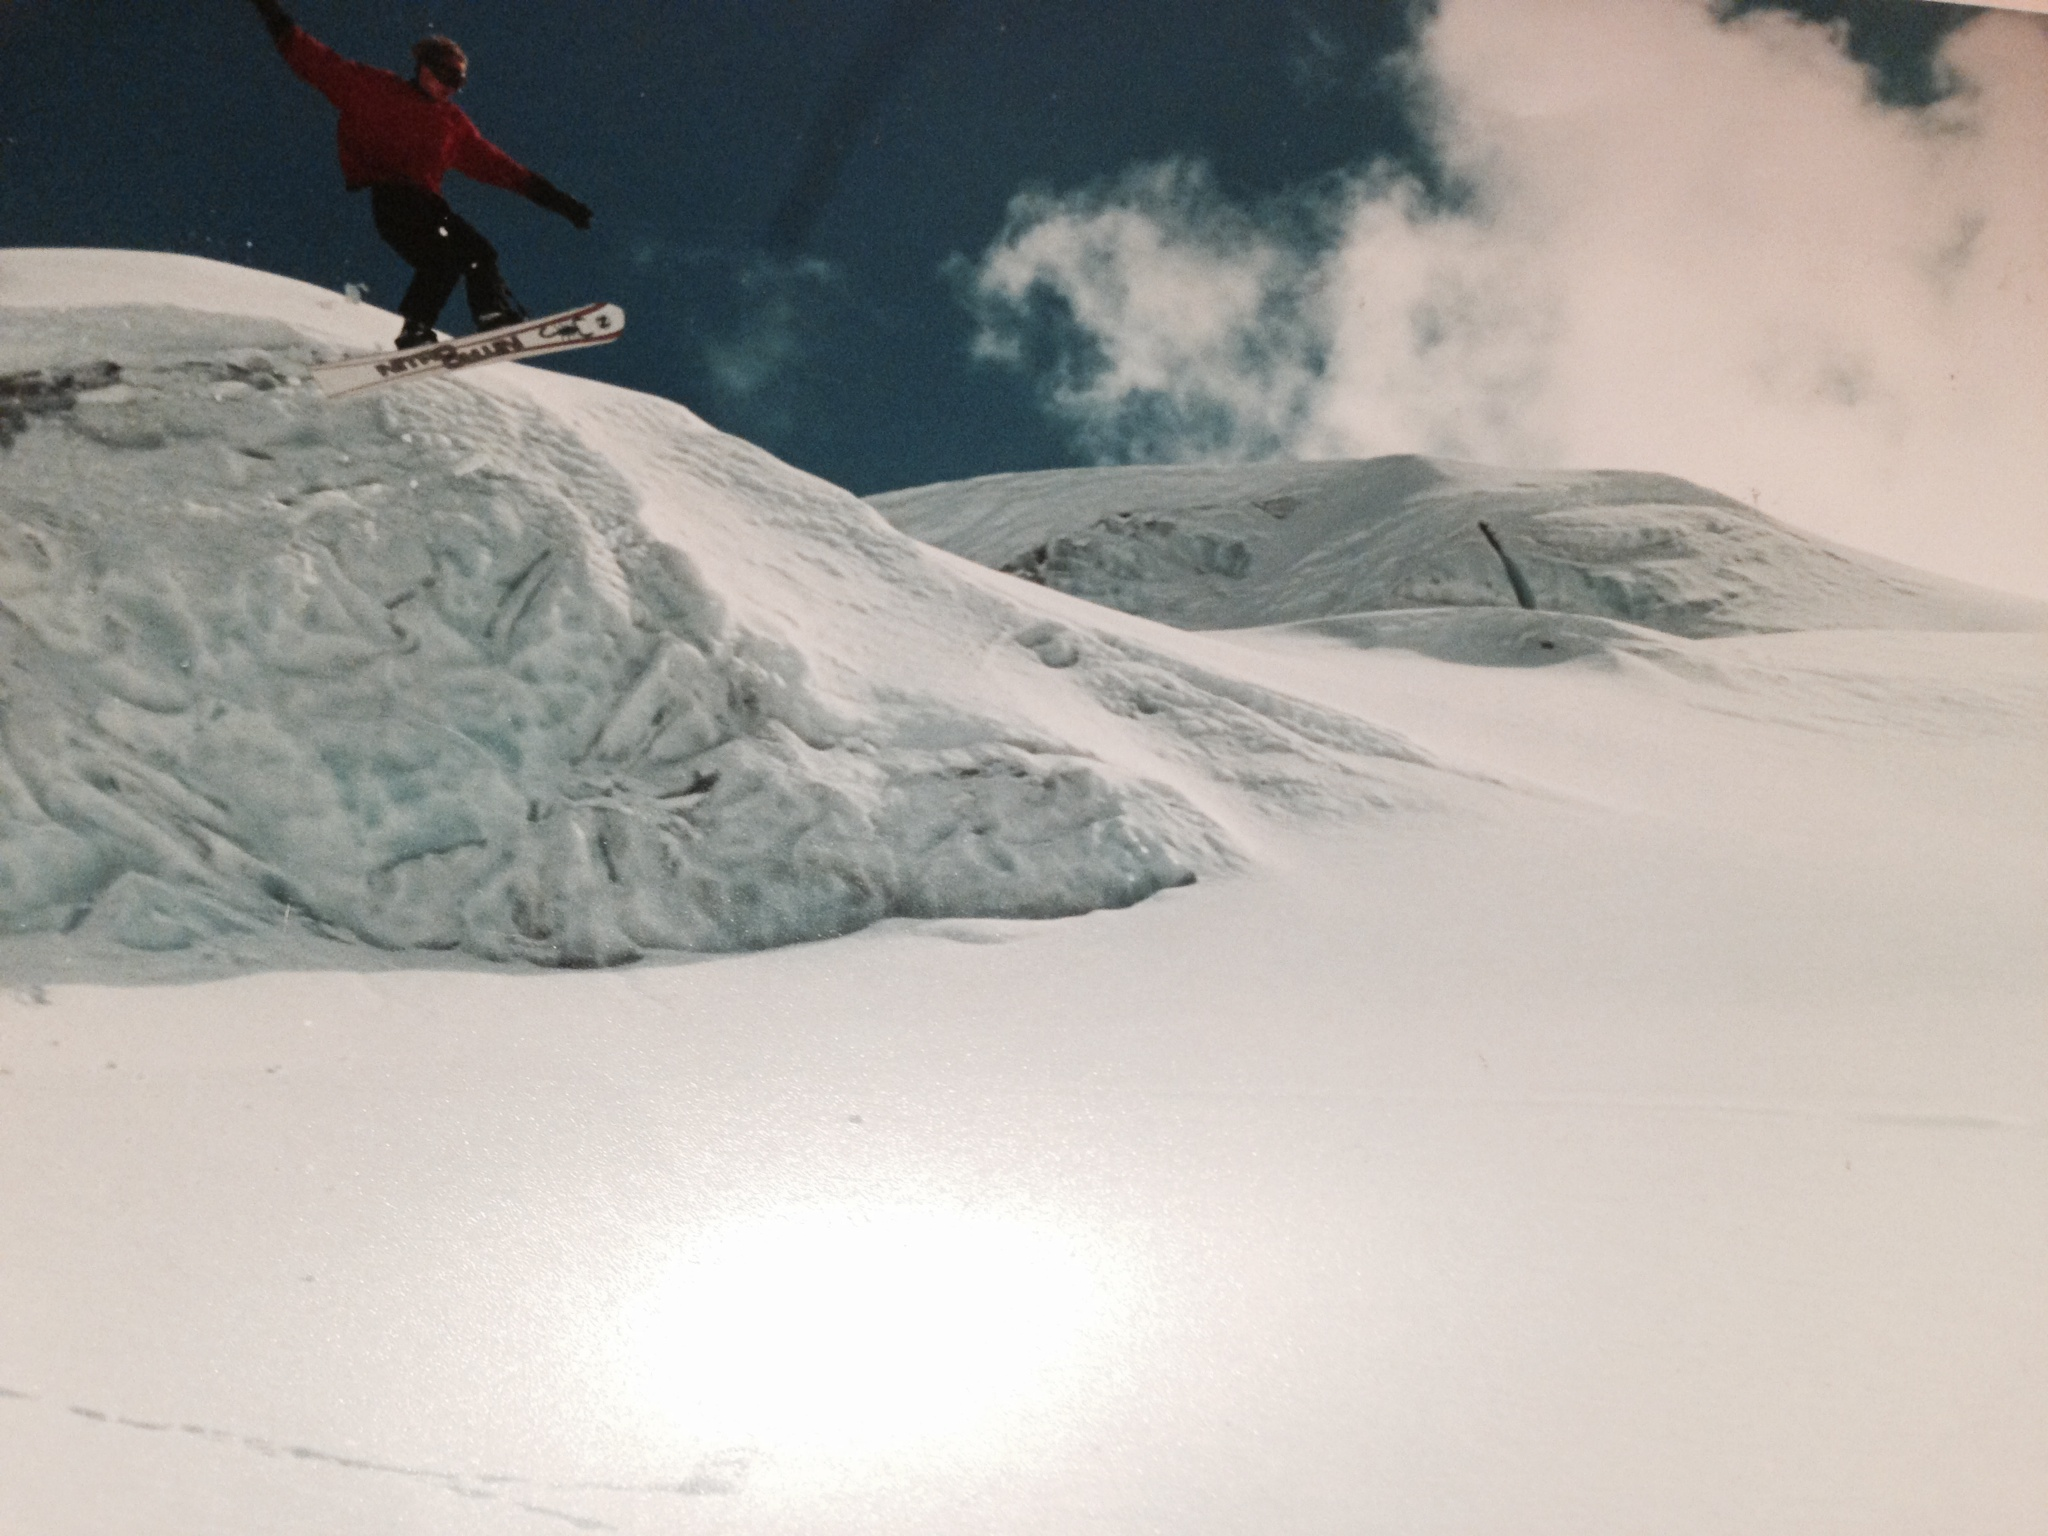 Raymond Witvoet snorbaard jump rettenbach 1994